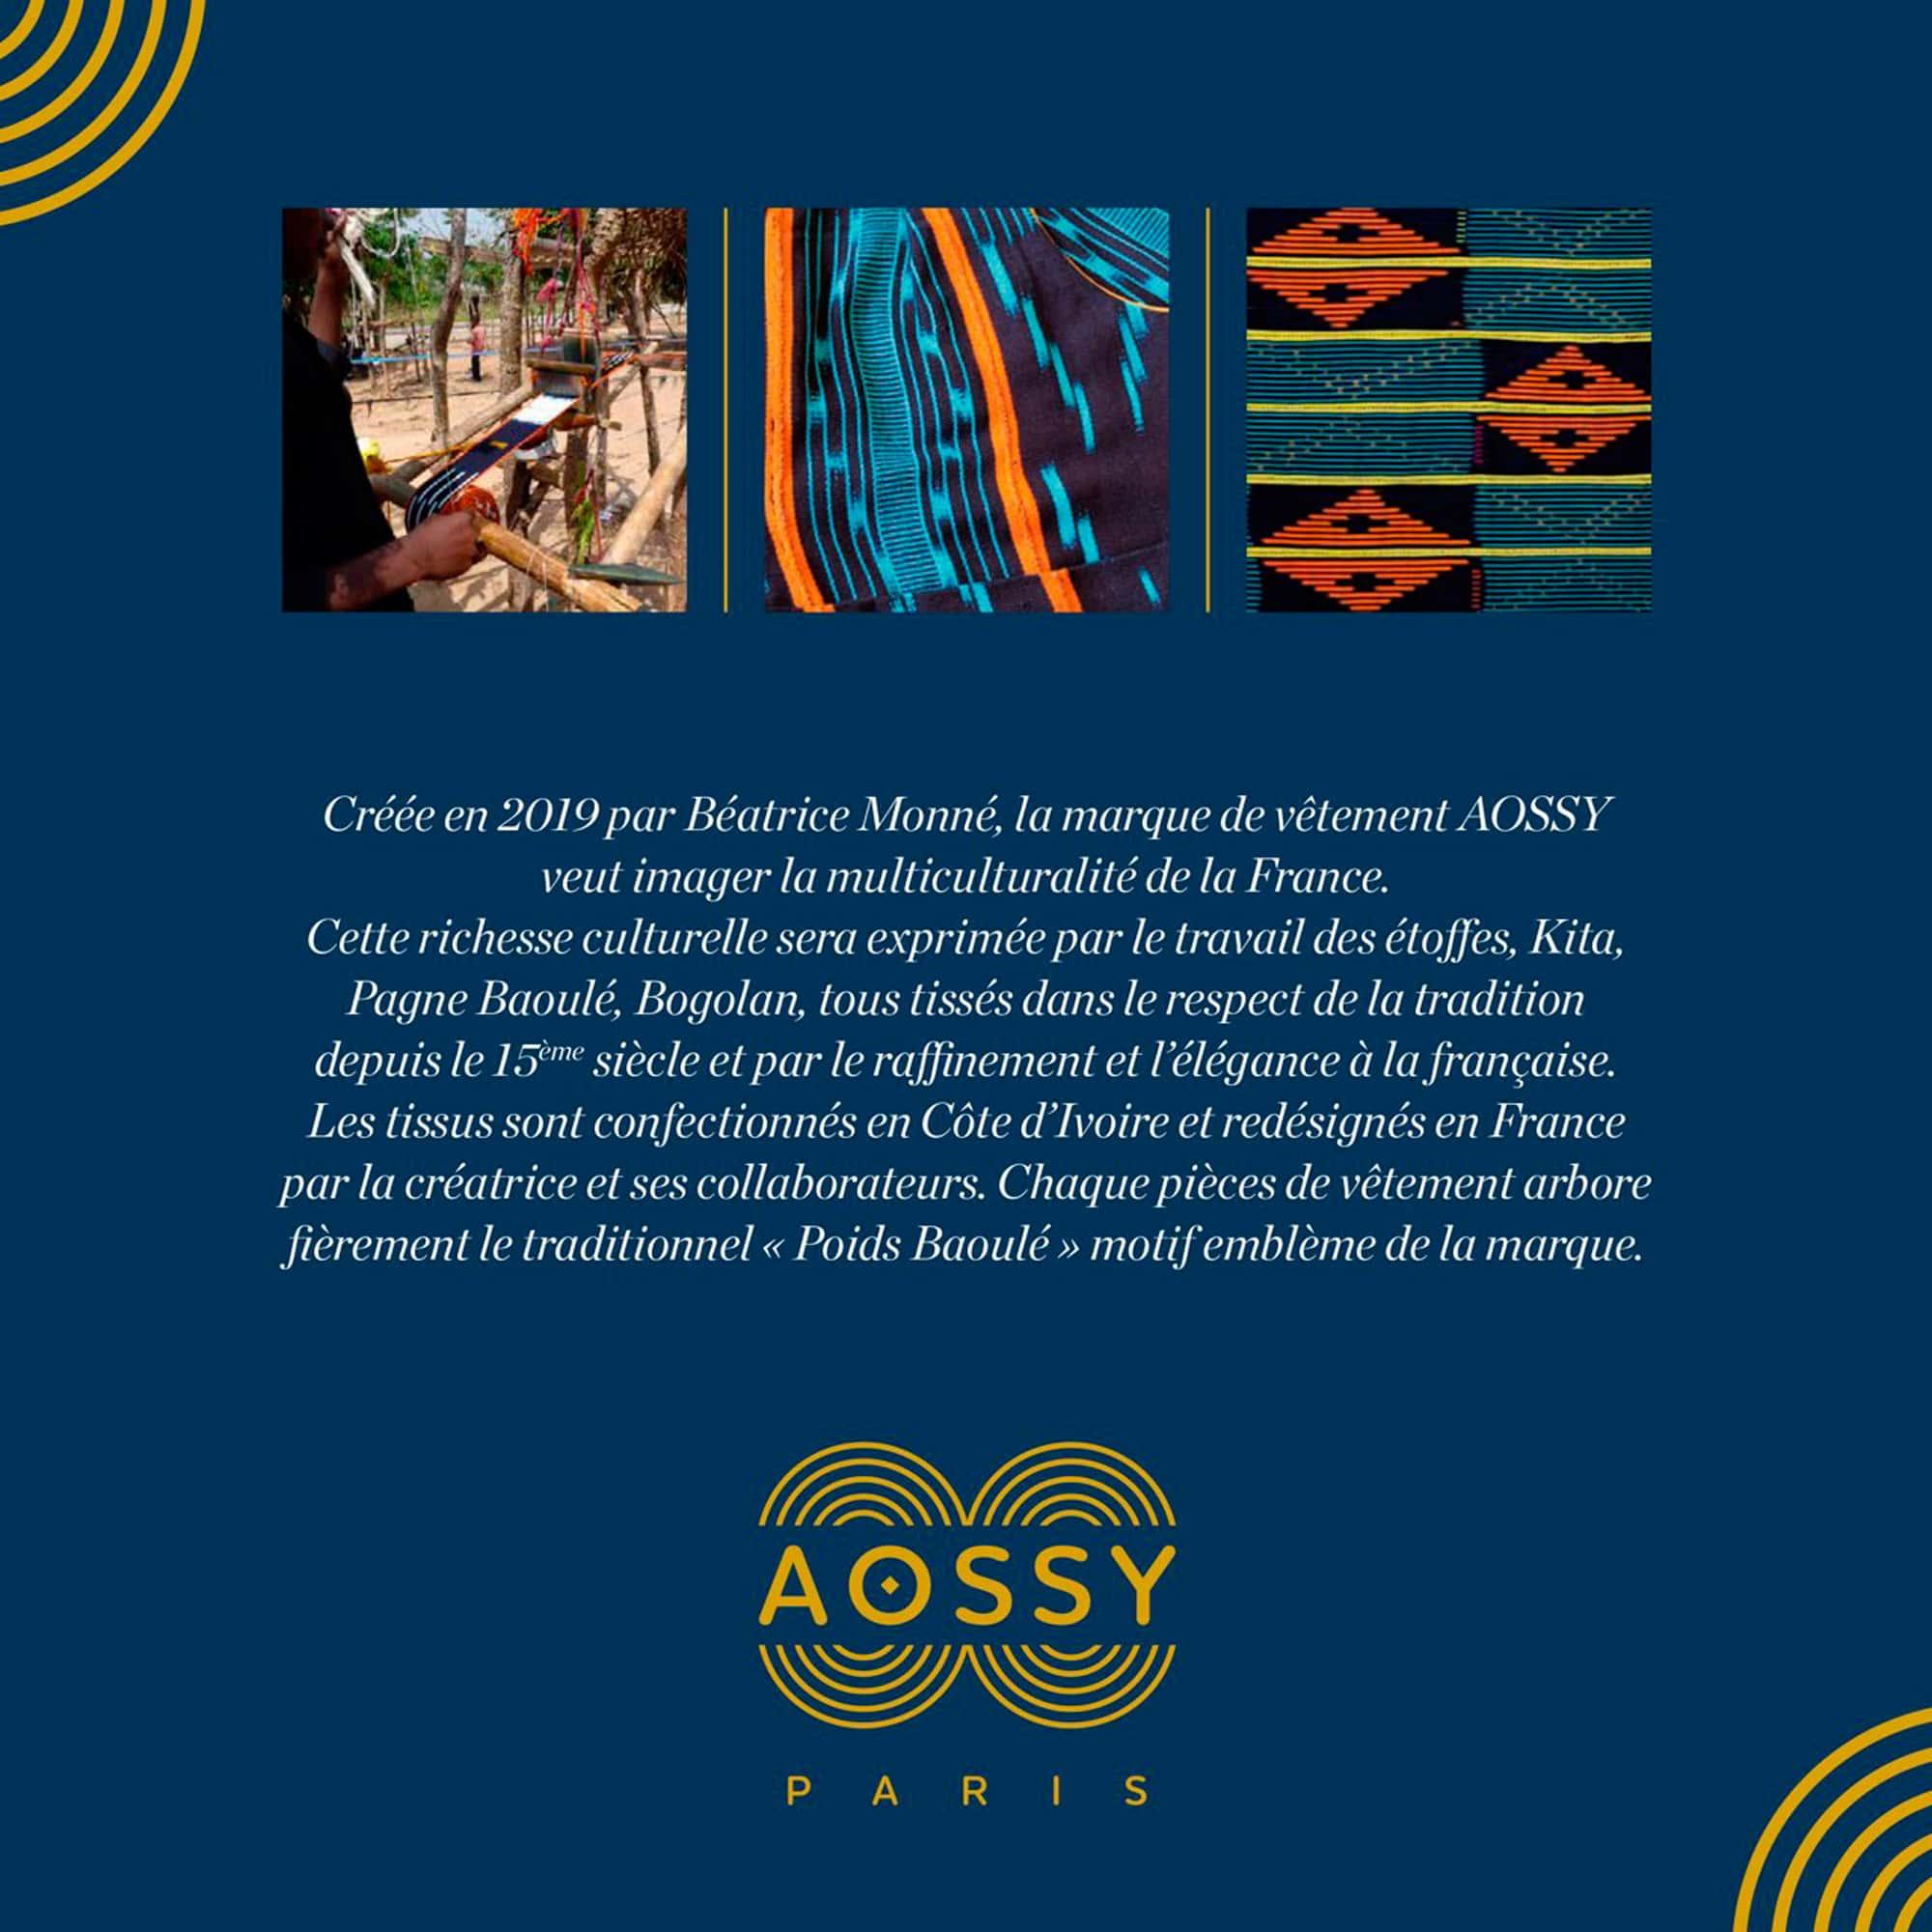 AOSSY-invitation-paper